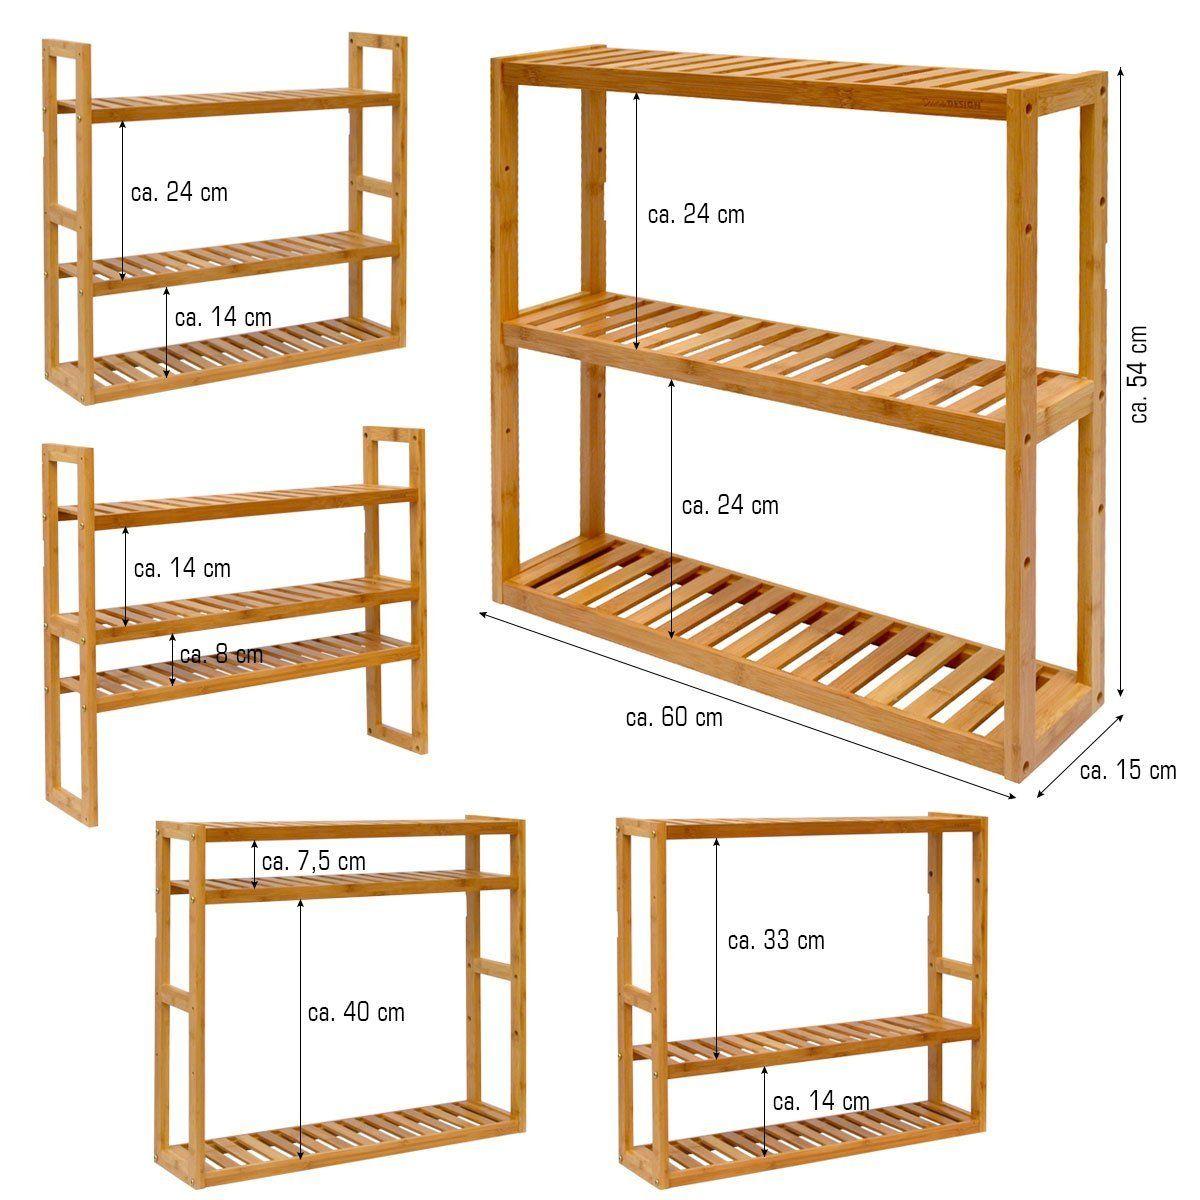 Dunedesign Wandregal 54x60x15cm Bambus Bad Regal 3 Facher Holz Ablage Badezimmer Hangeregal Aufbewahrung Ku Badezimmer Regal Holz Bambus Regal Badezimmer Regal